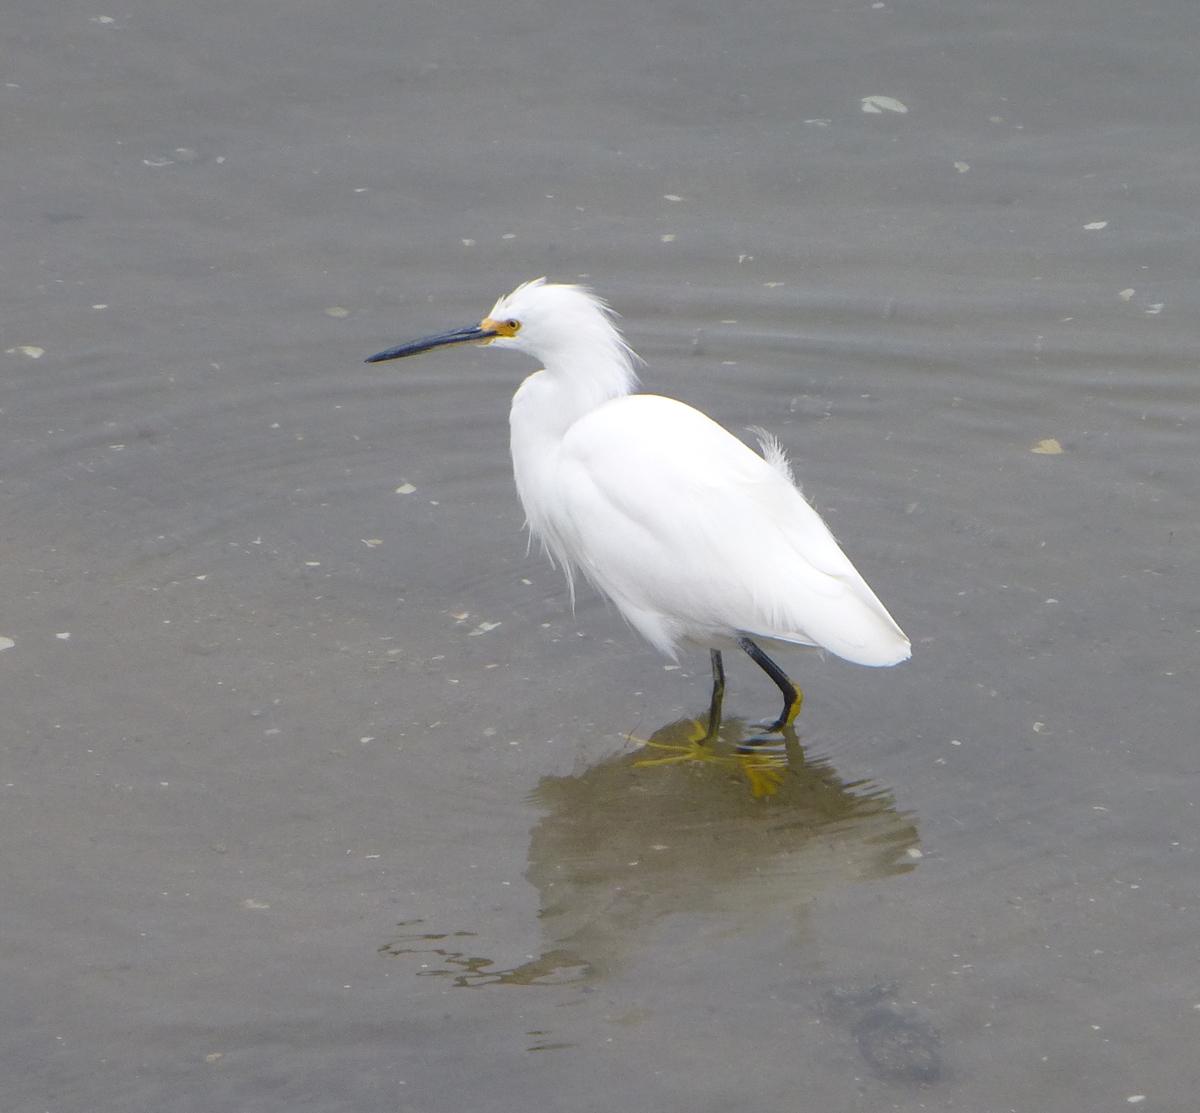 A Snowy Egret near Elkhorn Slough